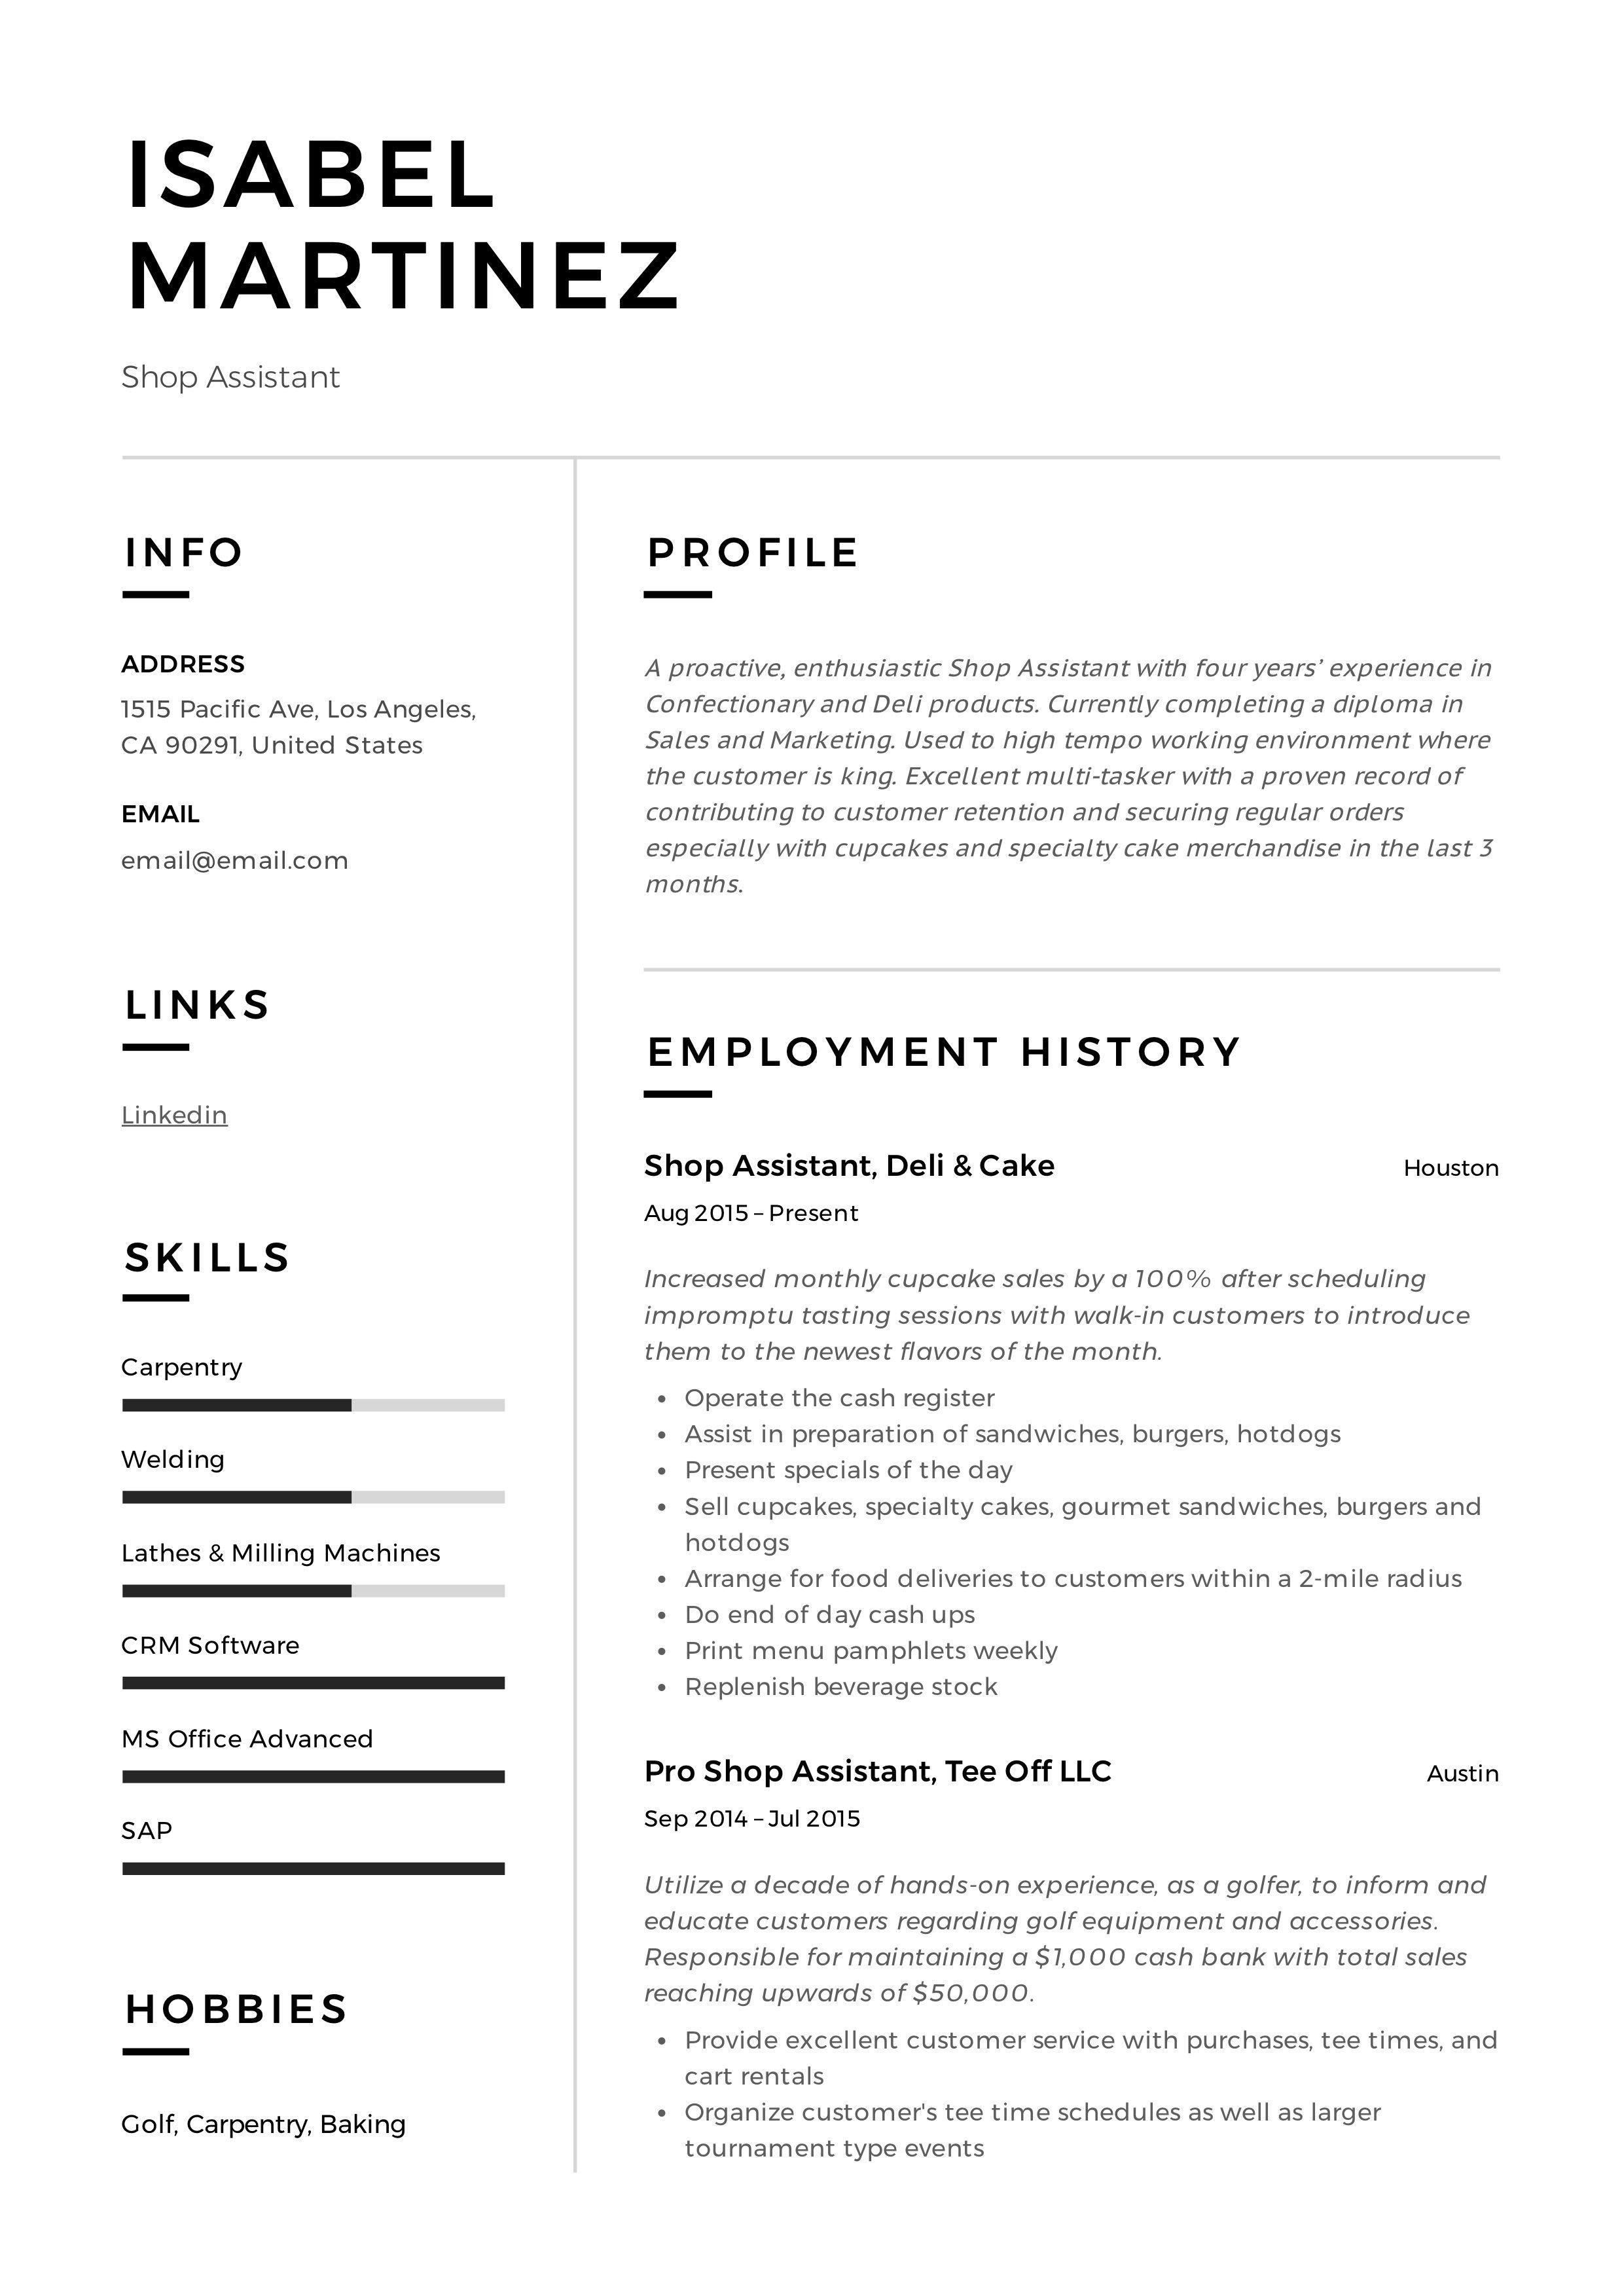 Professional Shop assistant Resume, template, design, tips